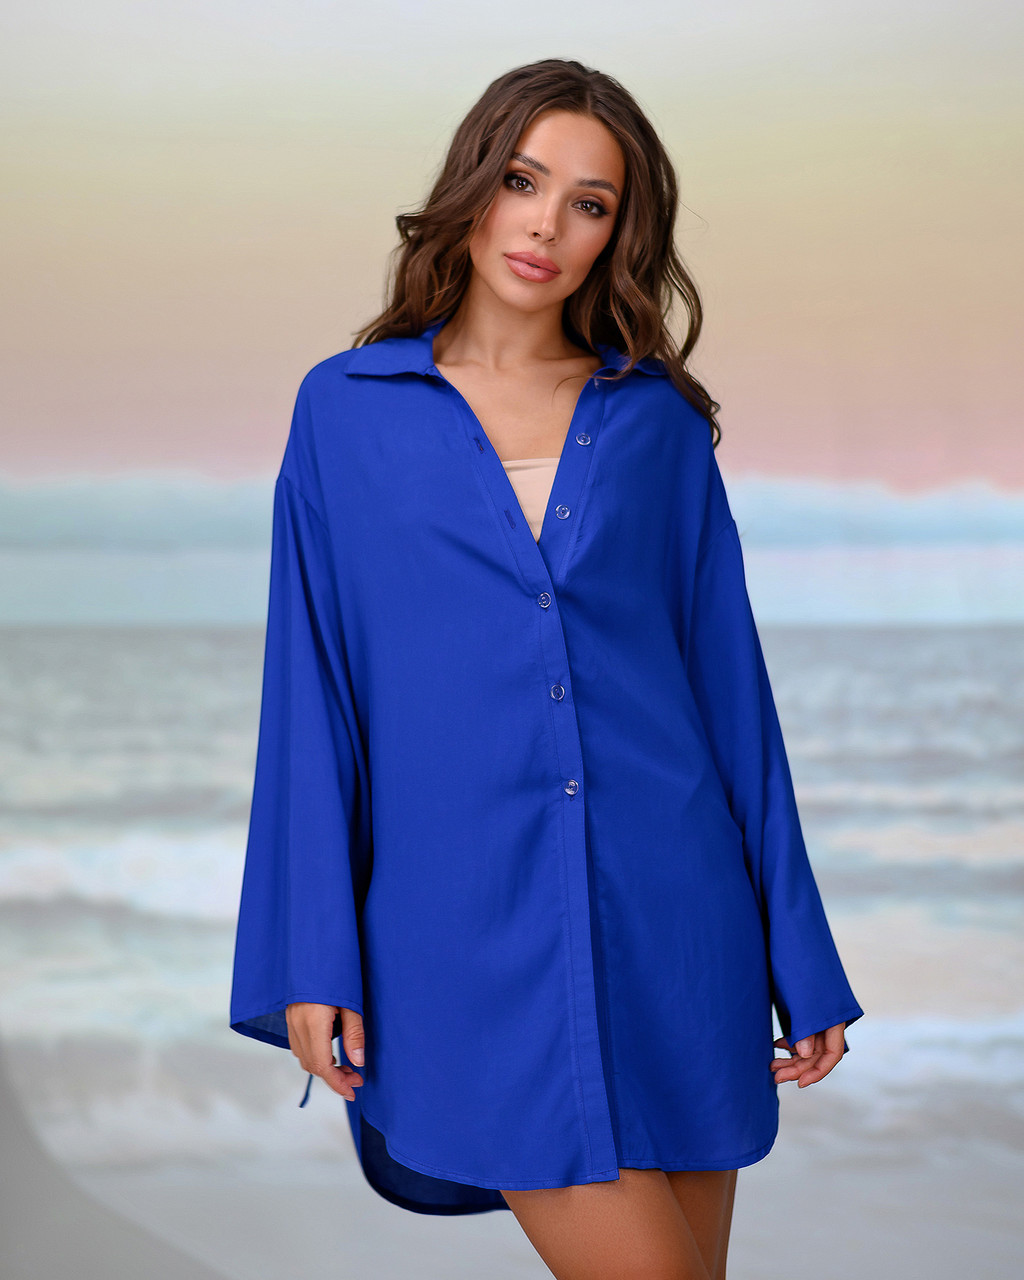 Короткая пляжная туника-рубашка.Цвет электрик. Размер 42-44